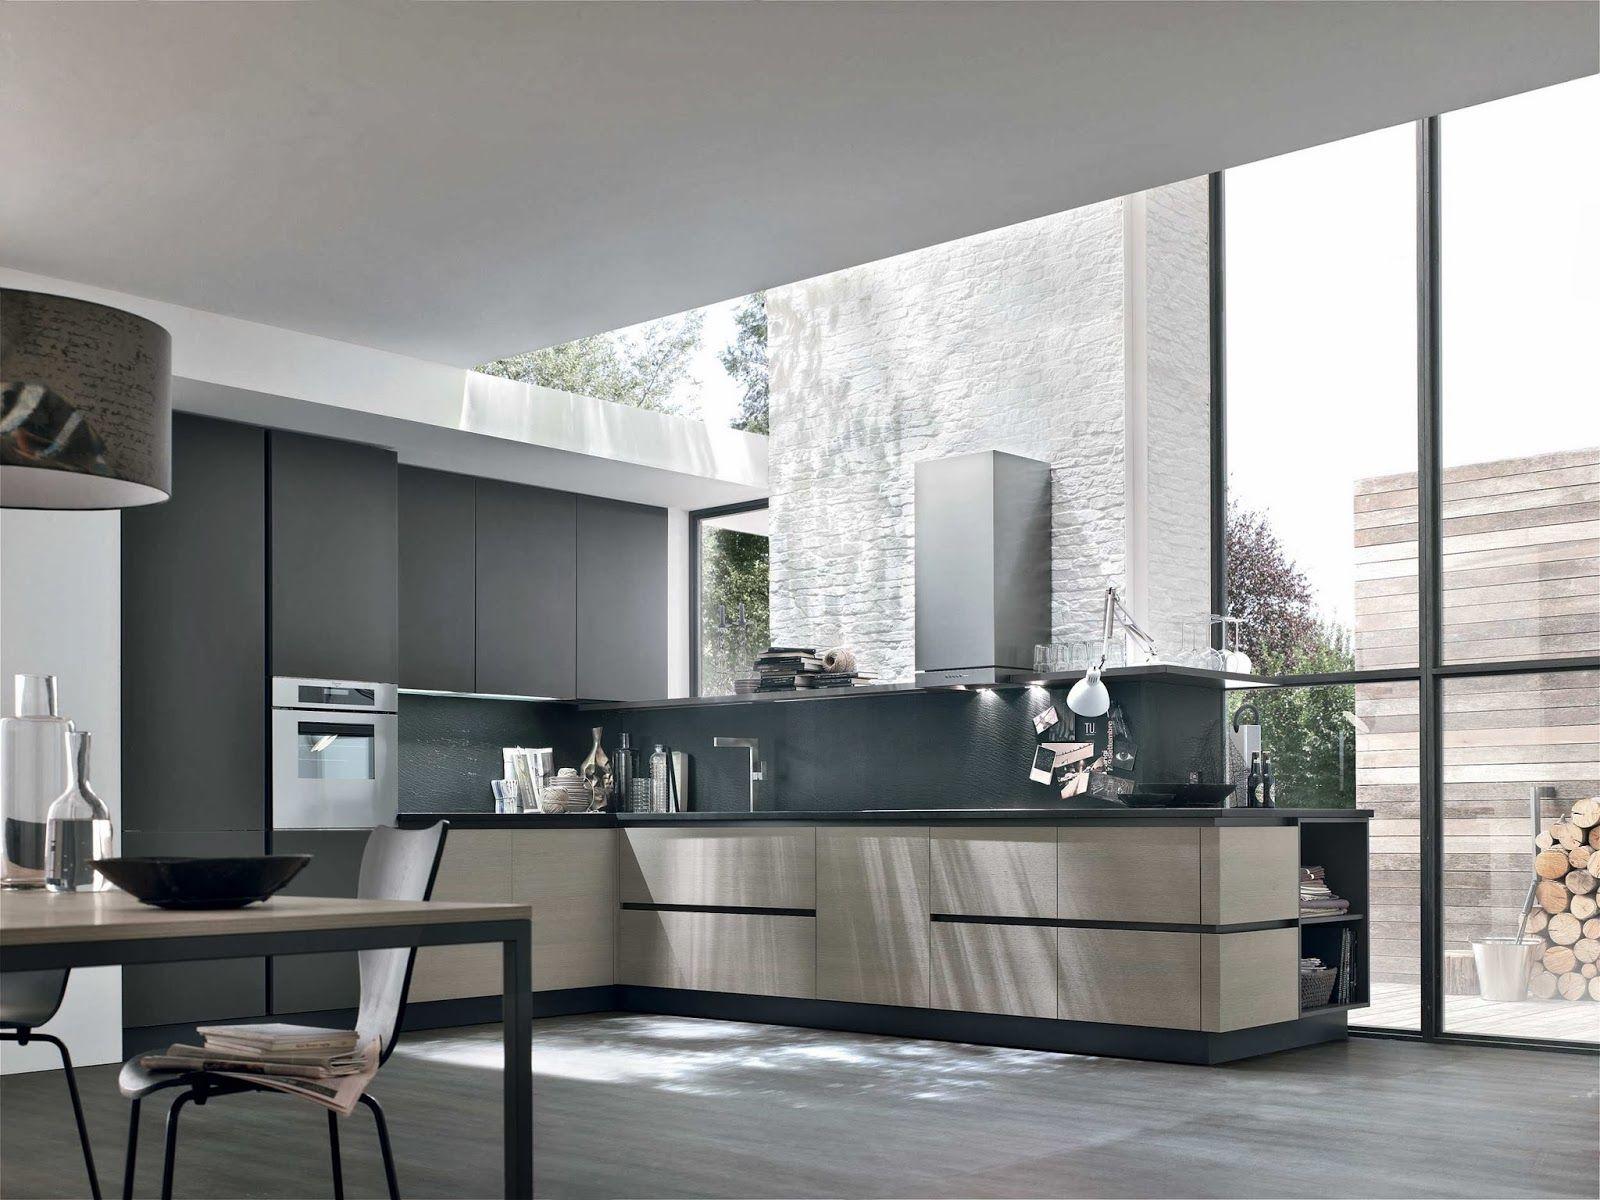 cuisine moderne sans poign es en l taupe et gris anthracite par stosa cuisines kitchen. Black Bedroom Furniture Sets. Home Design Ideas